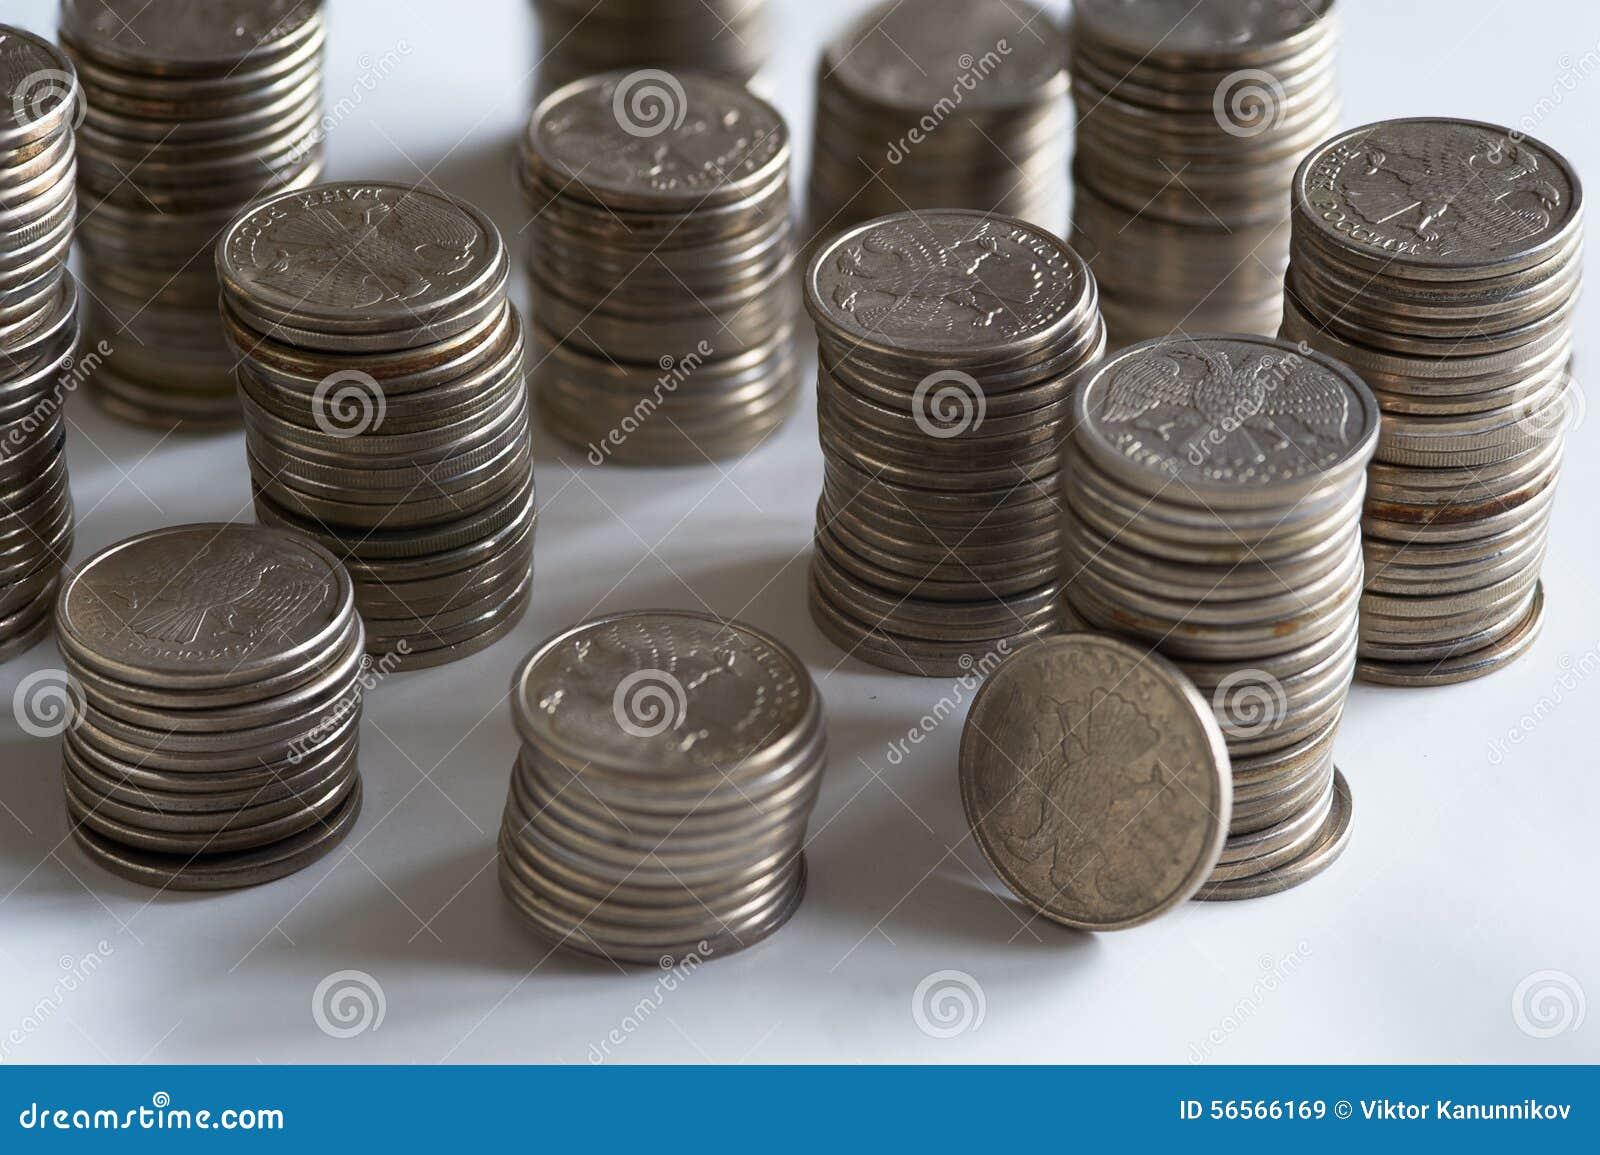 Download Νομίσματα στοκ εικόνα. εικόνα από διαμορφωμένος, εργασία - 56566169